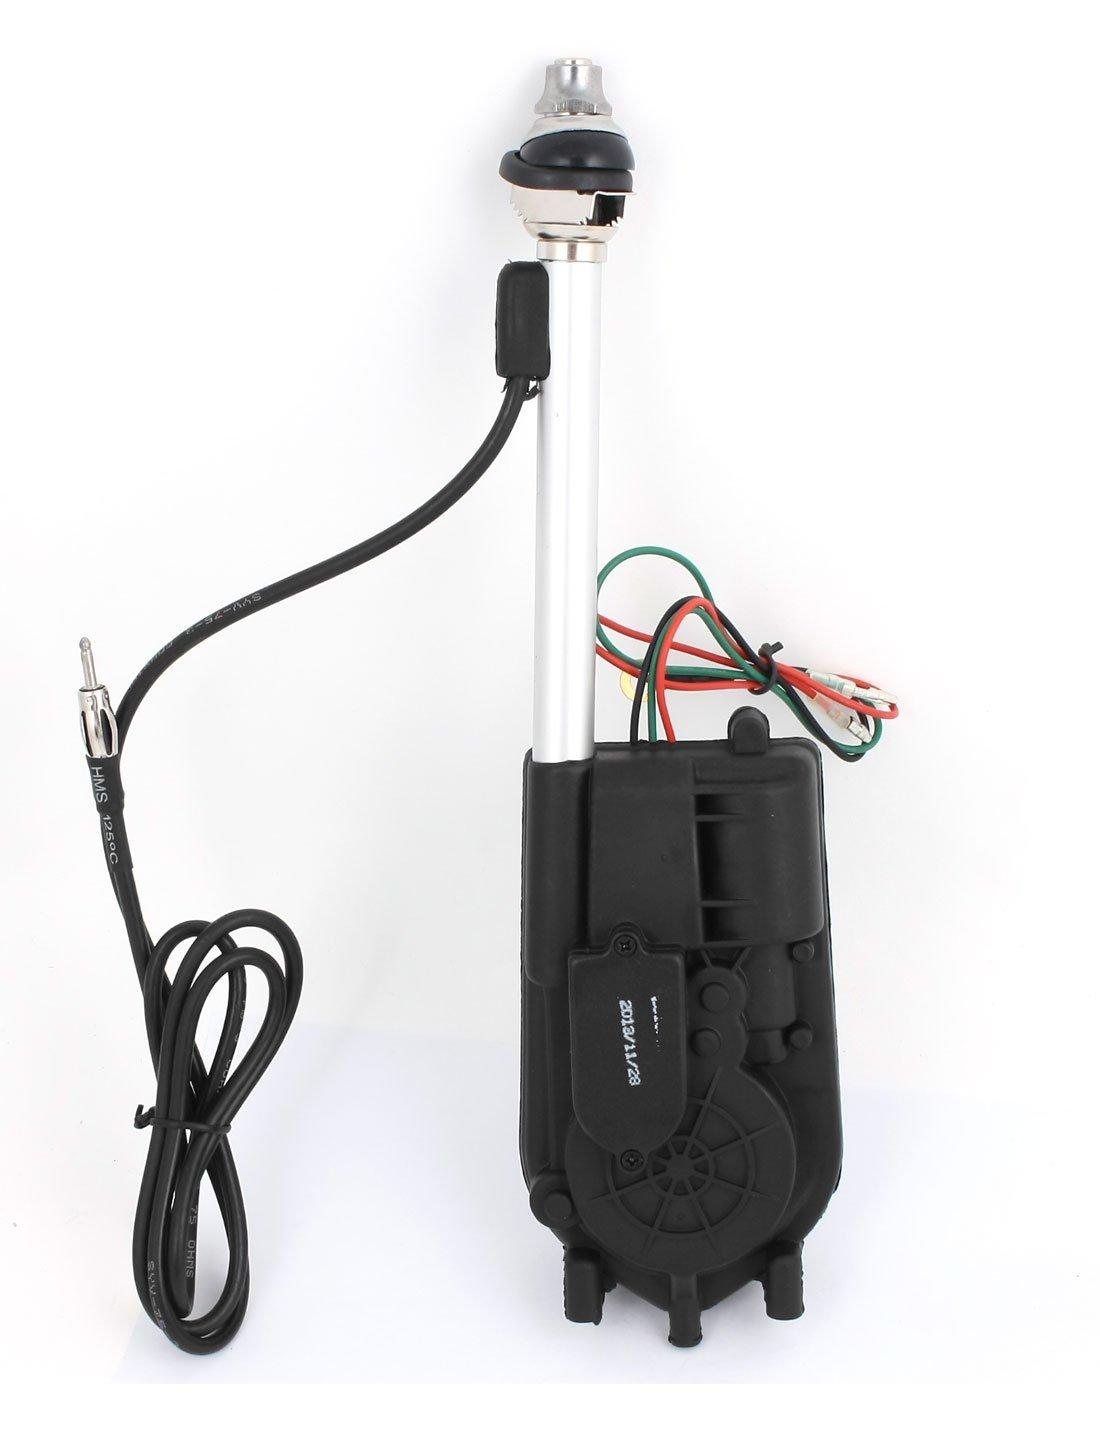 Amazon.com: uxcell DC 12V Universal AM FM Radio Electric Automatic Antenna  Black BF-686: Electronics